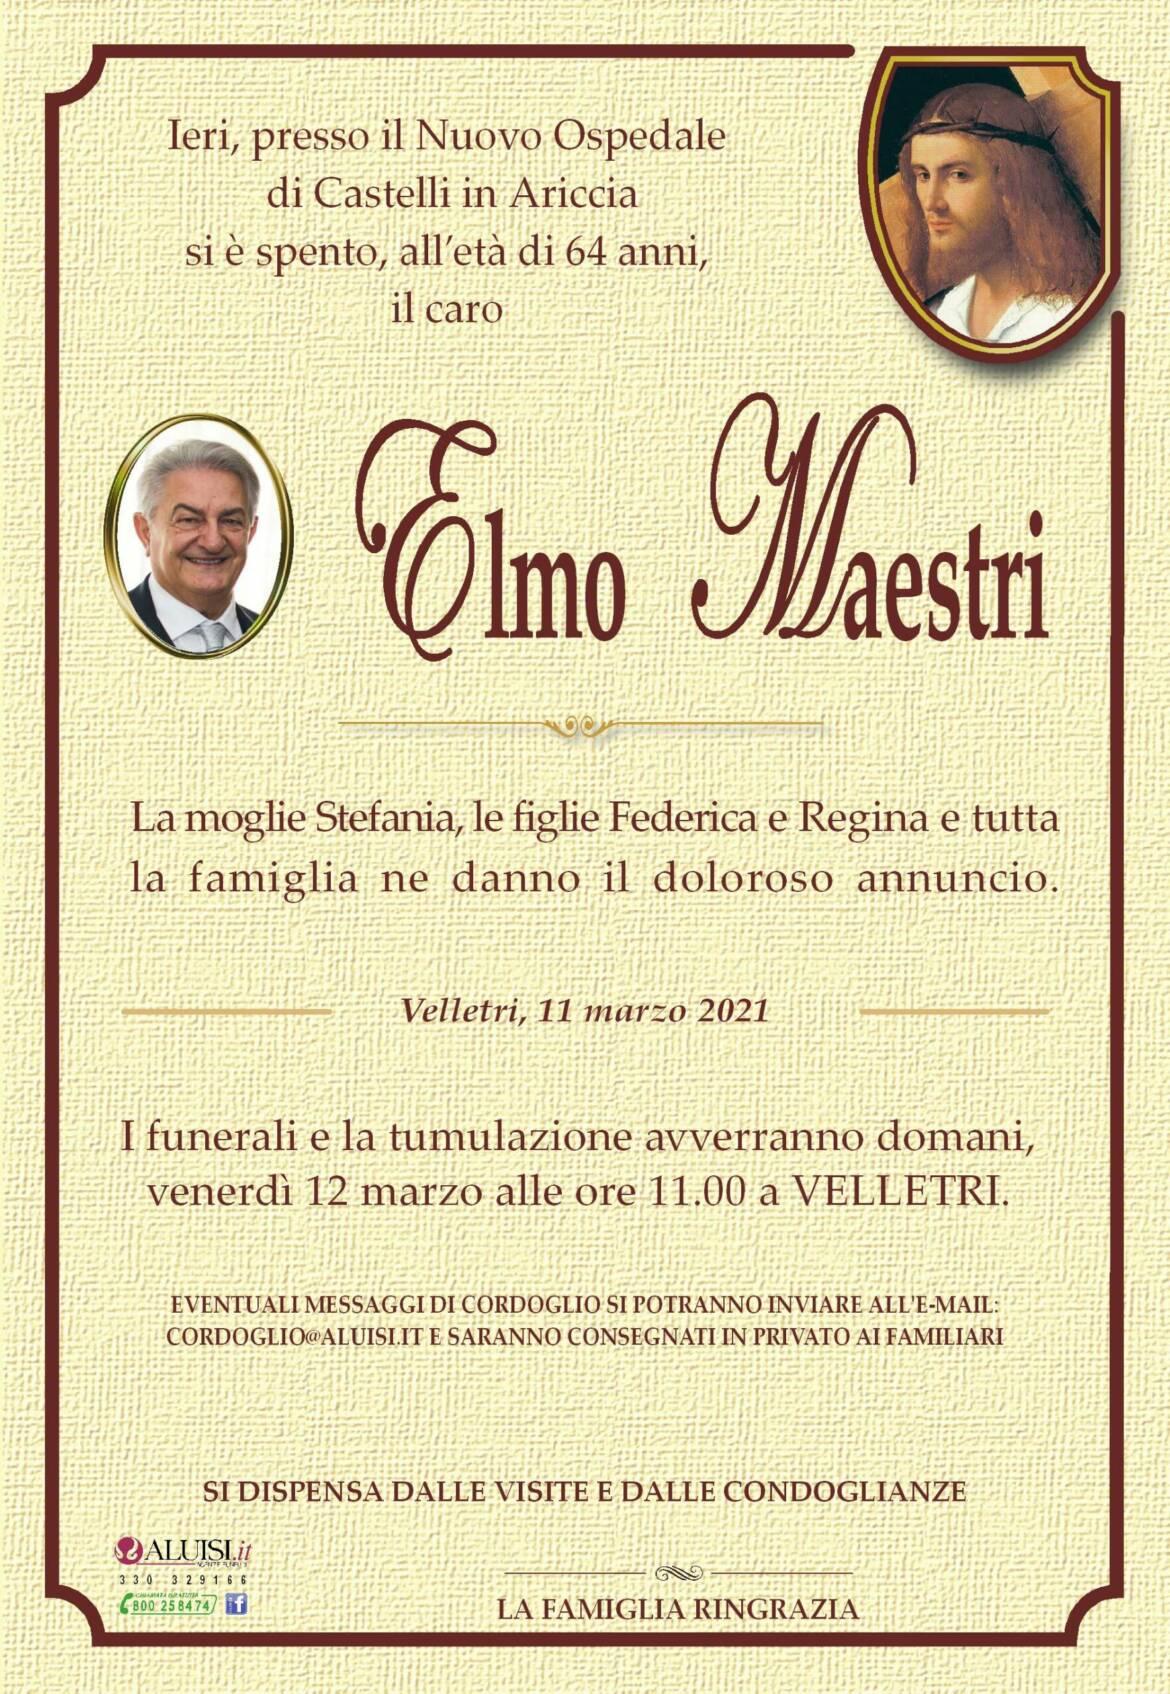 Annuncio-GAETANO-MAESTRI-COLLEPASSO-1-scaled.jpg